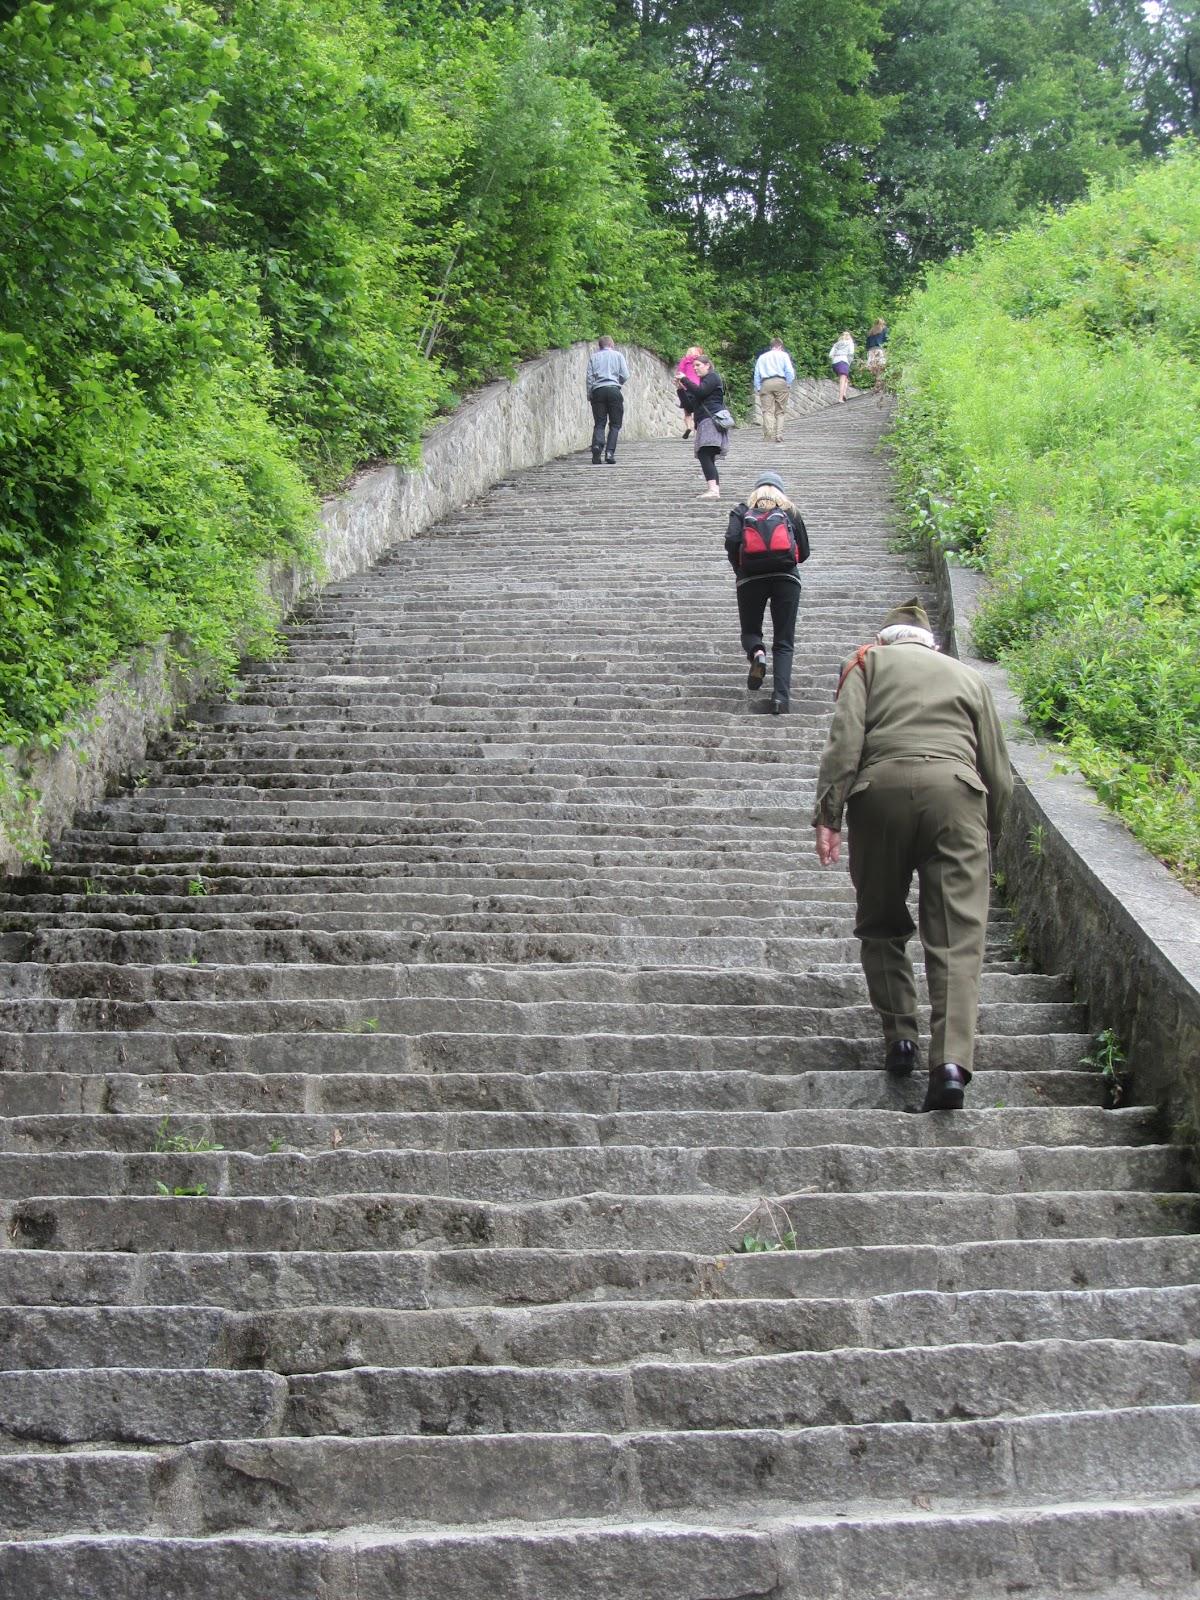 Carlas Got The Travel Bug: Mauthausen Concentration Camp